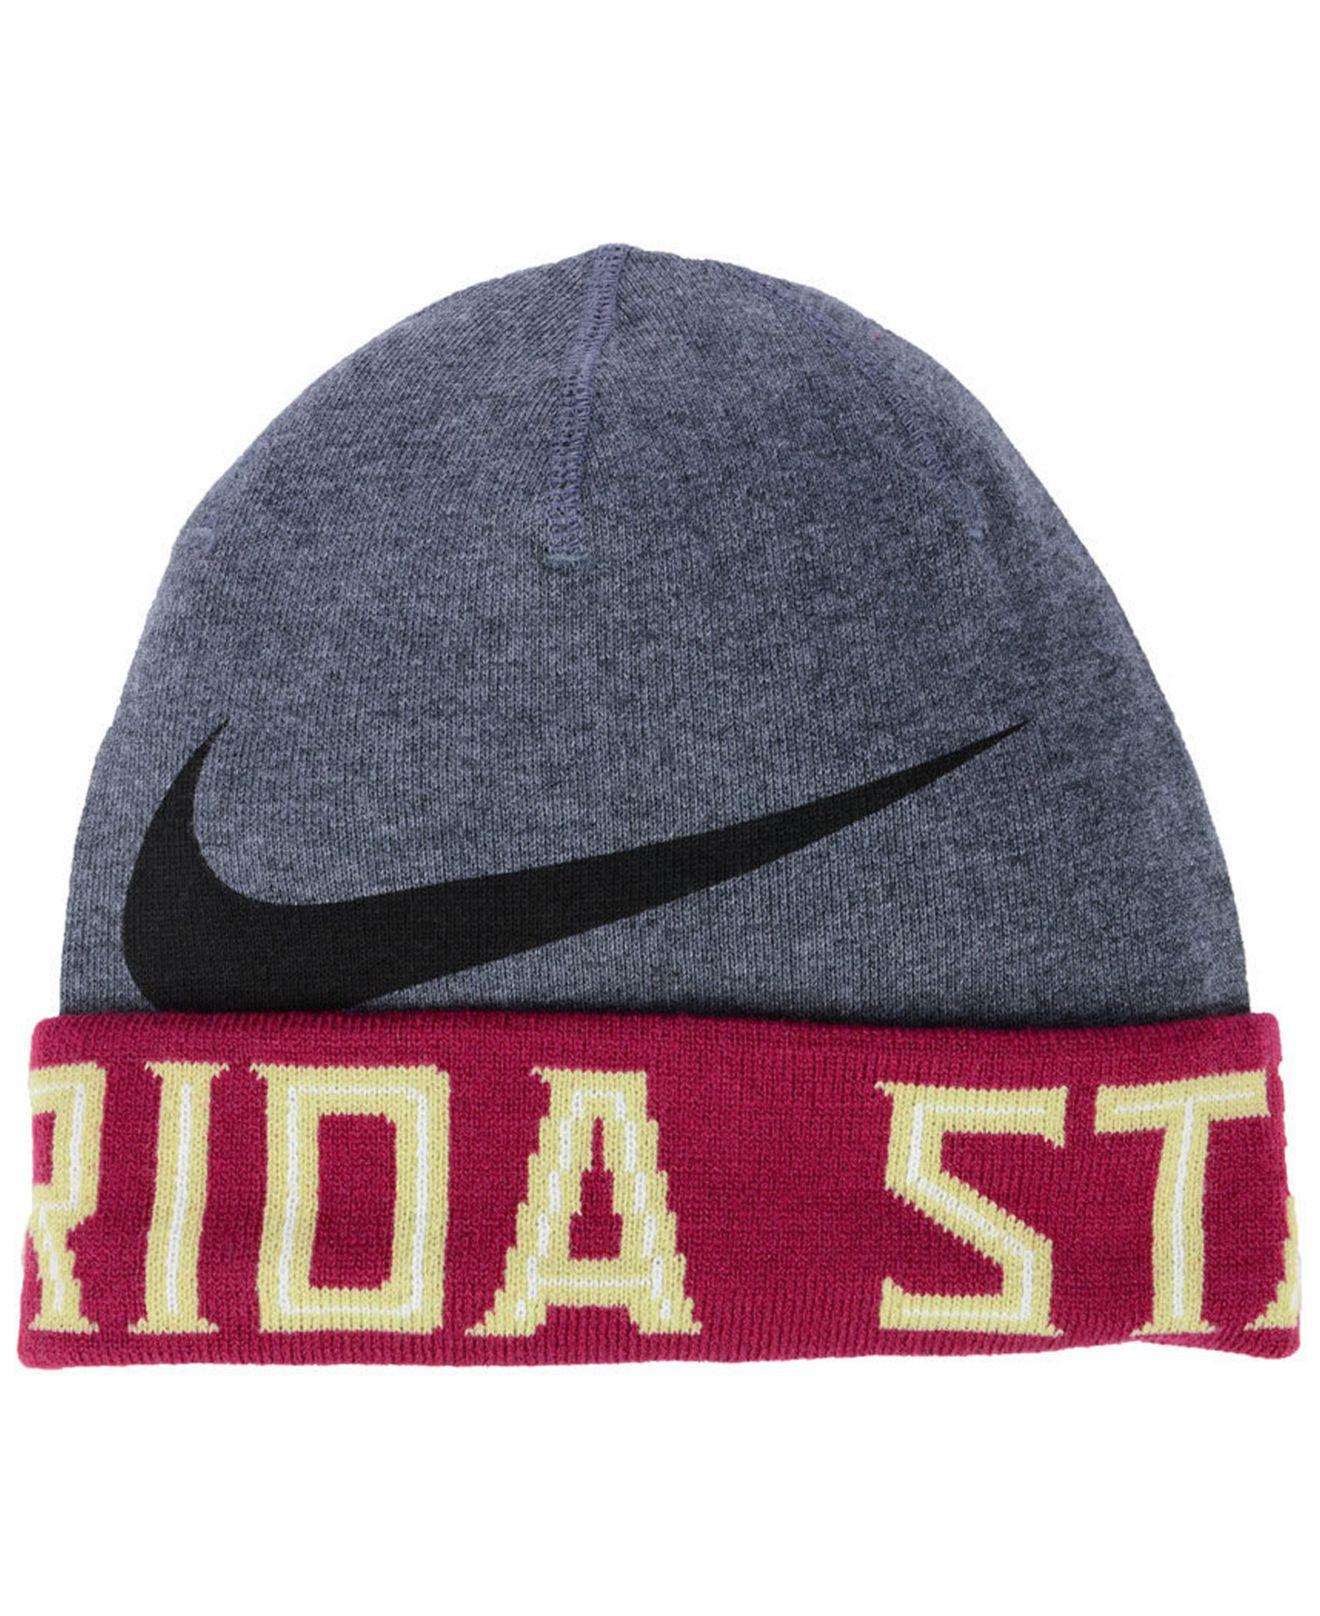 b3166df91cd61f Lyst - Nike Florida State Seminoles Training Beanie Knit Hat in Gray ...